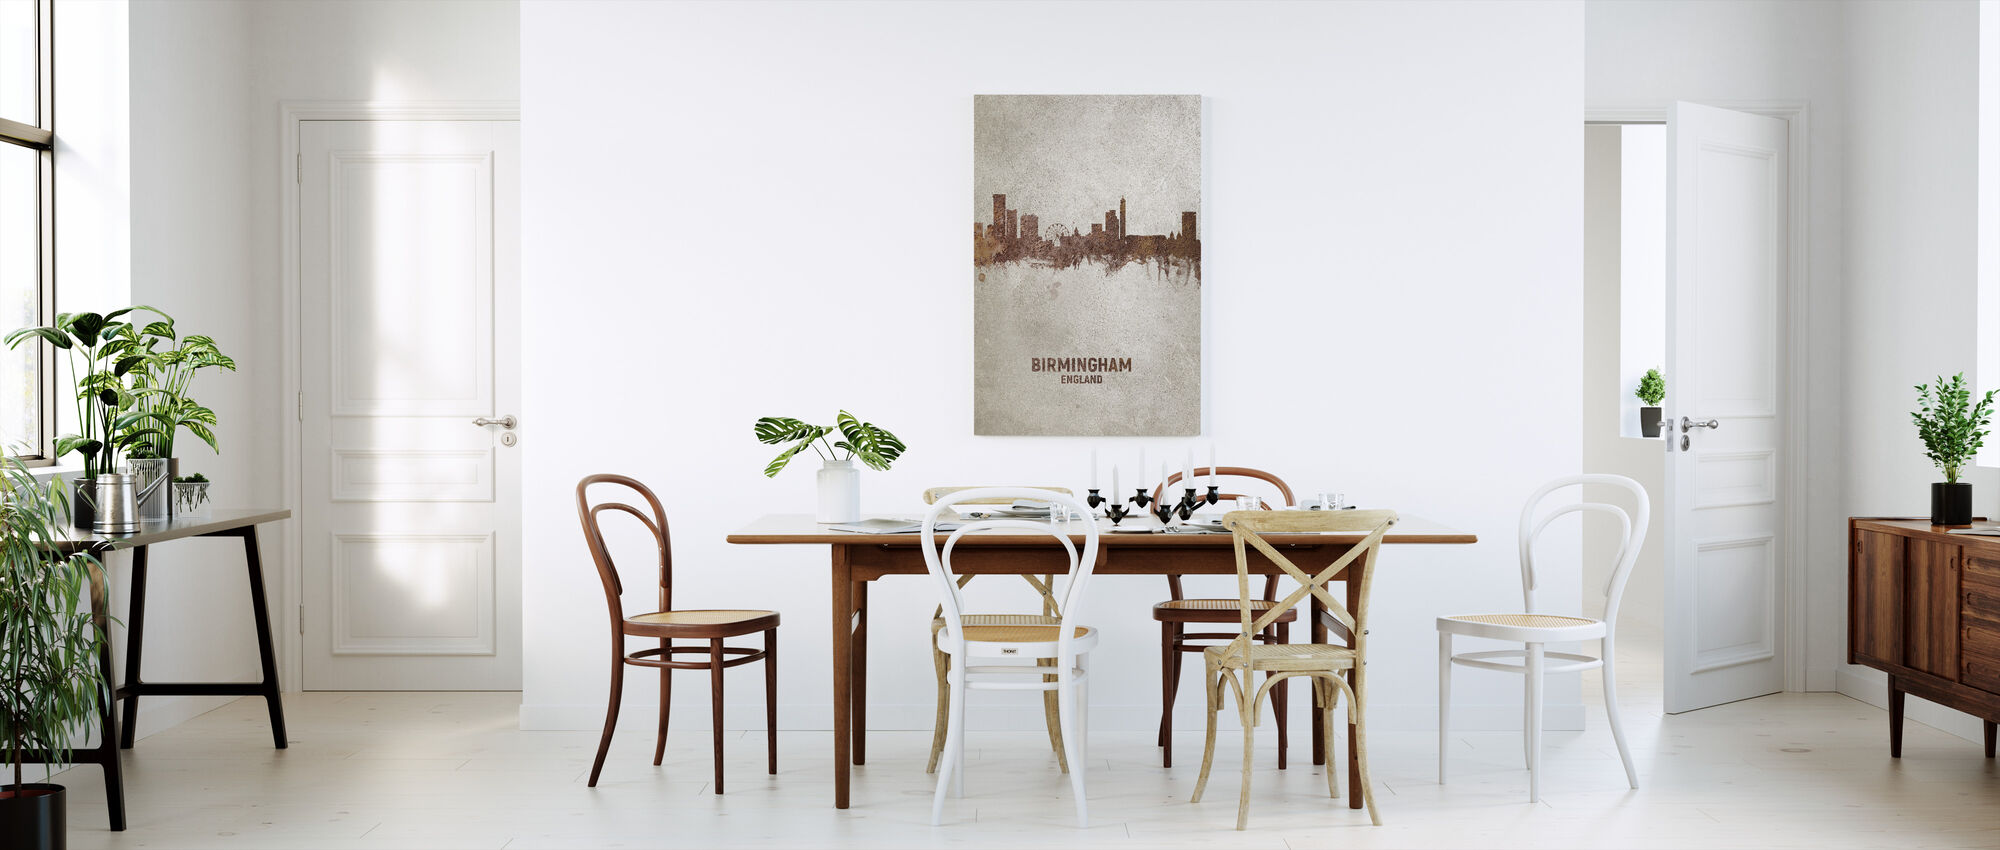 Birmingham England Rust Skyline - Canvas print - Kitchen